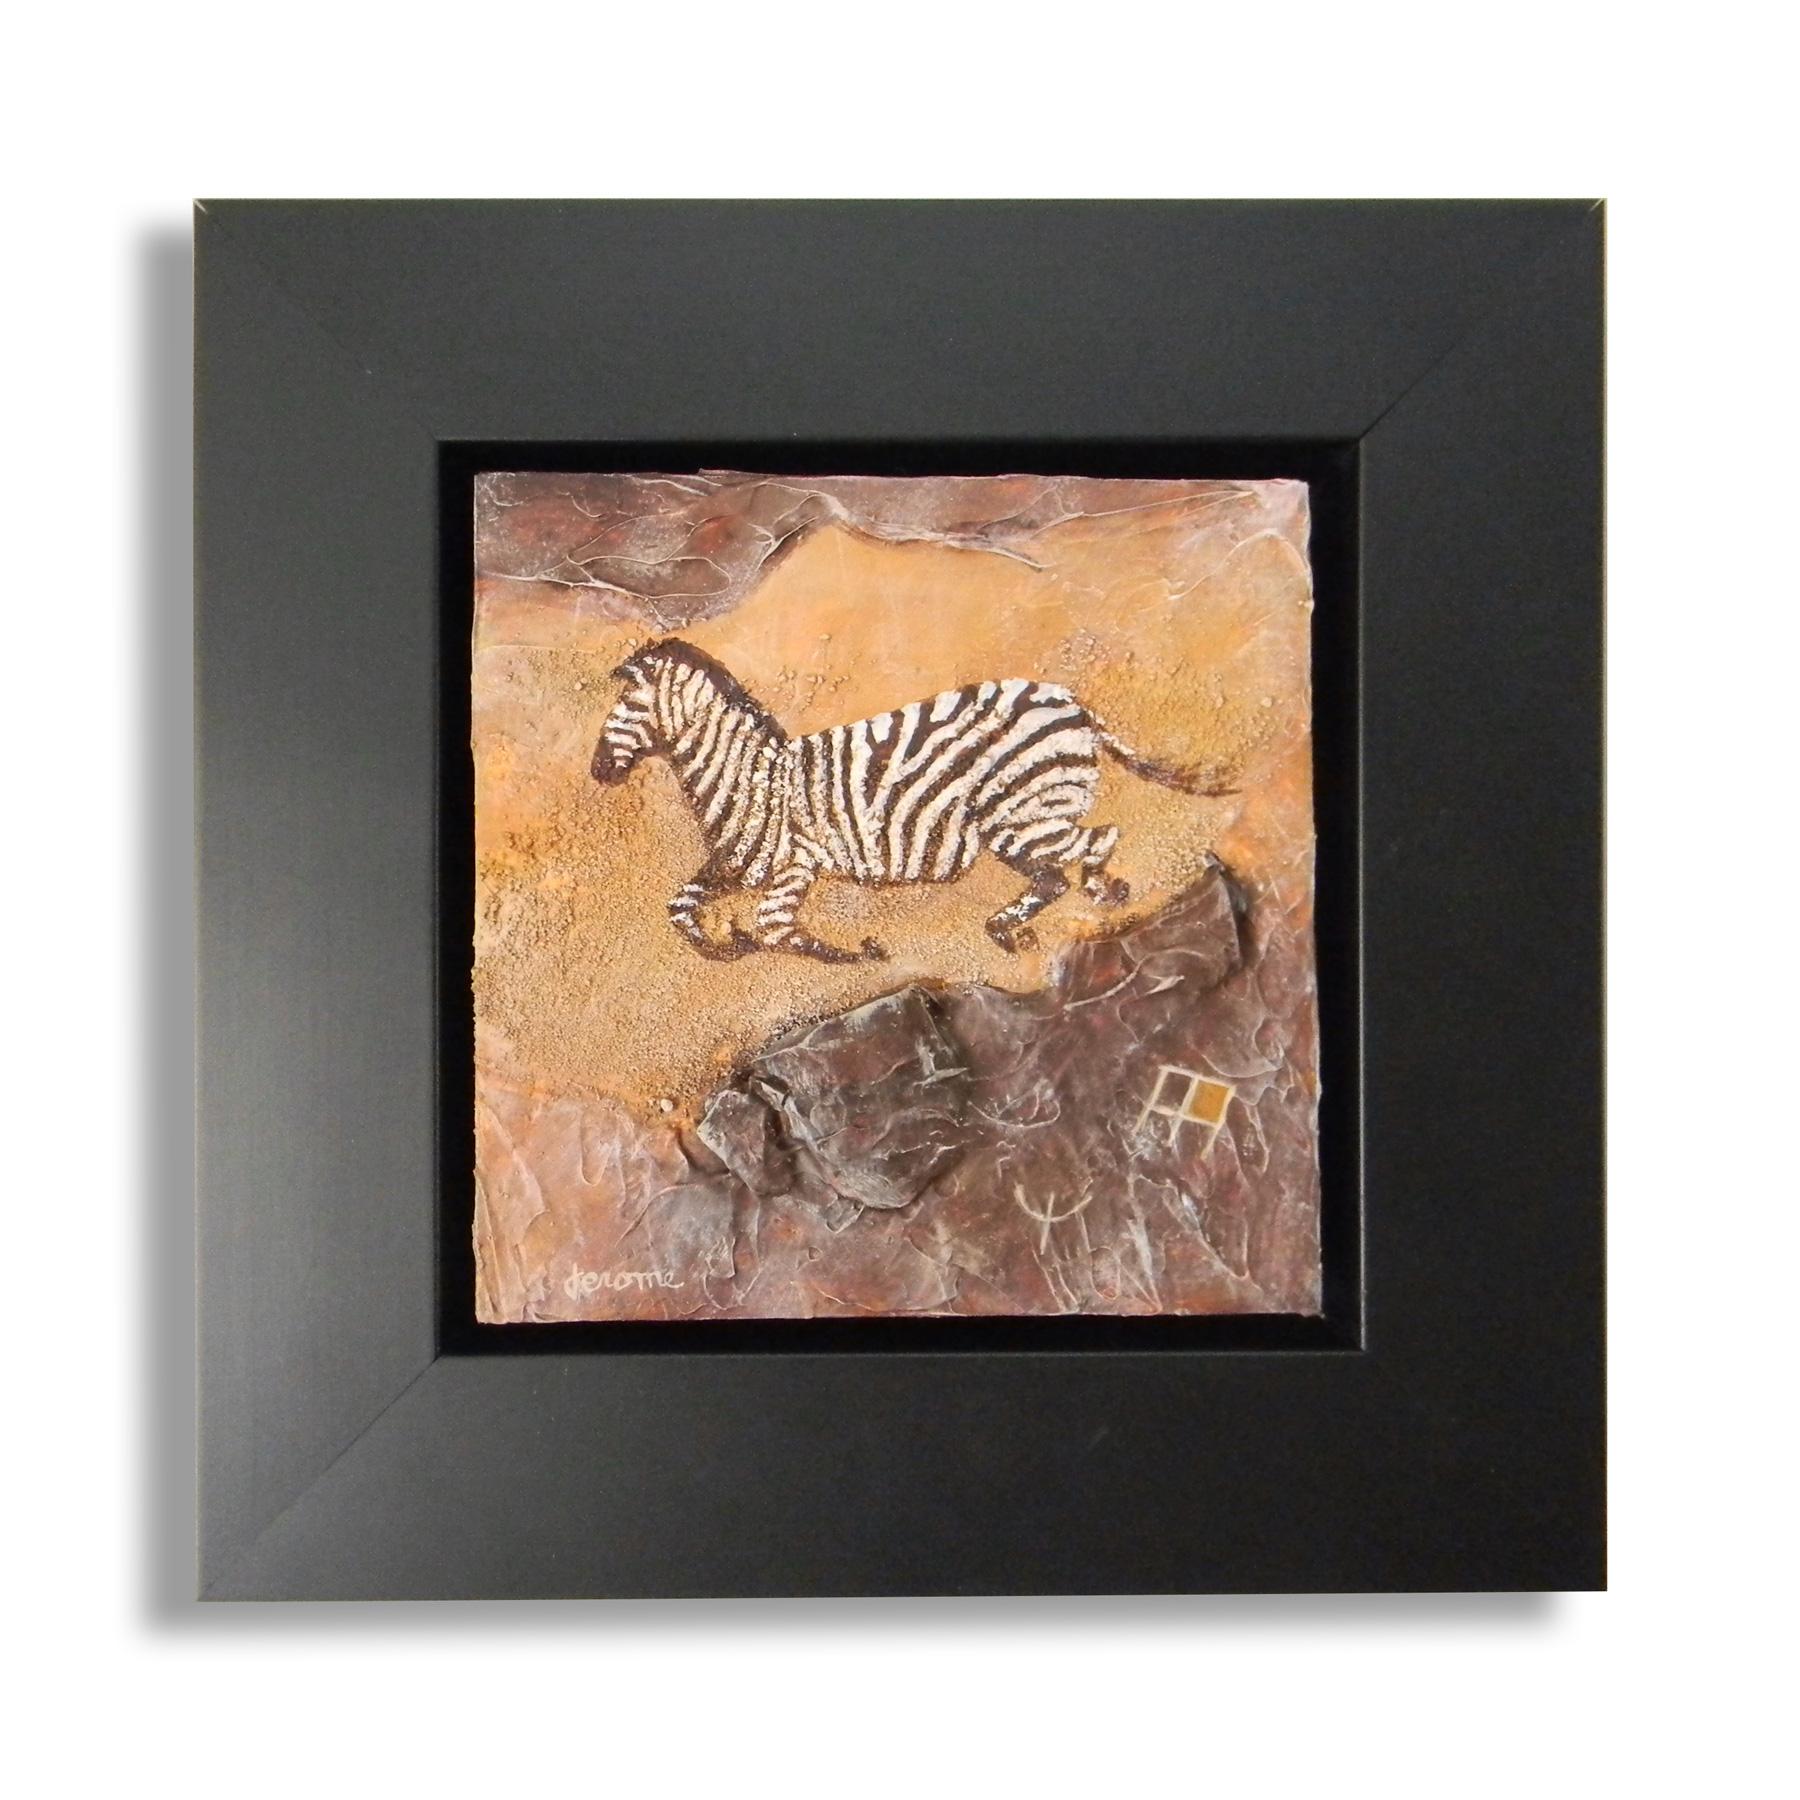 https://0901.nccdn.net/4_2/000/000/009/253/running-zebra.jpg